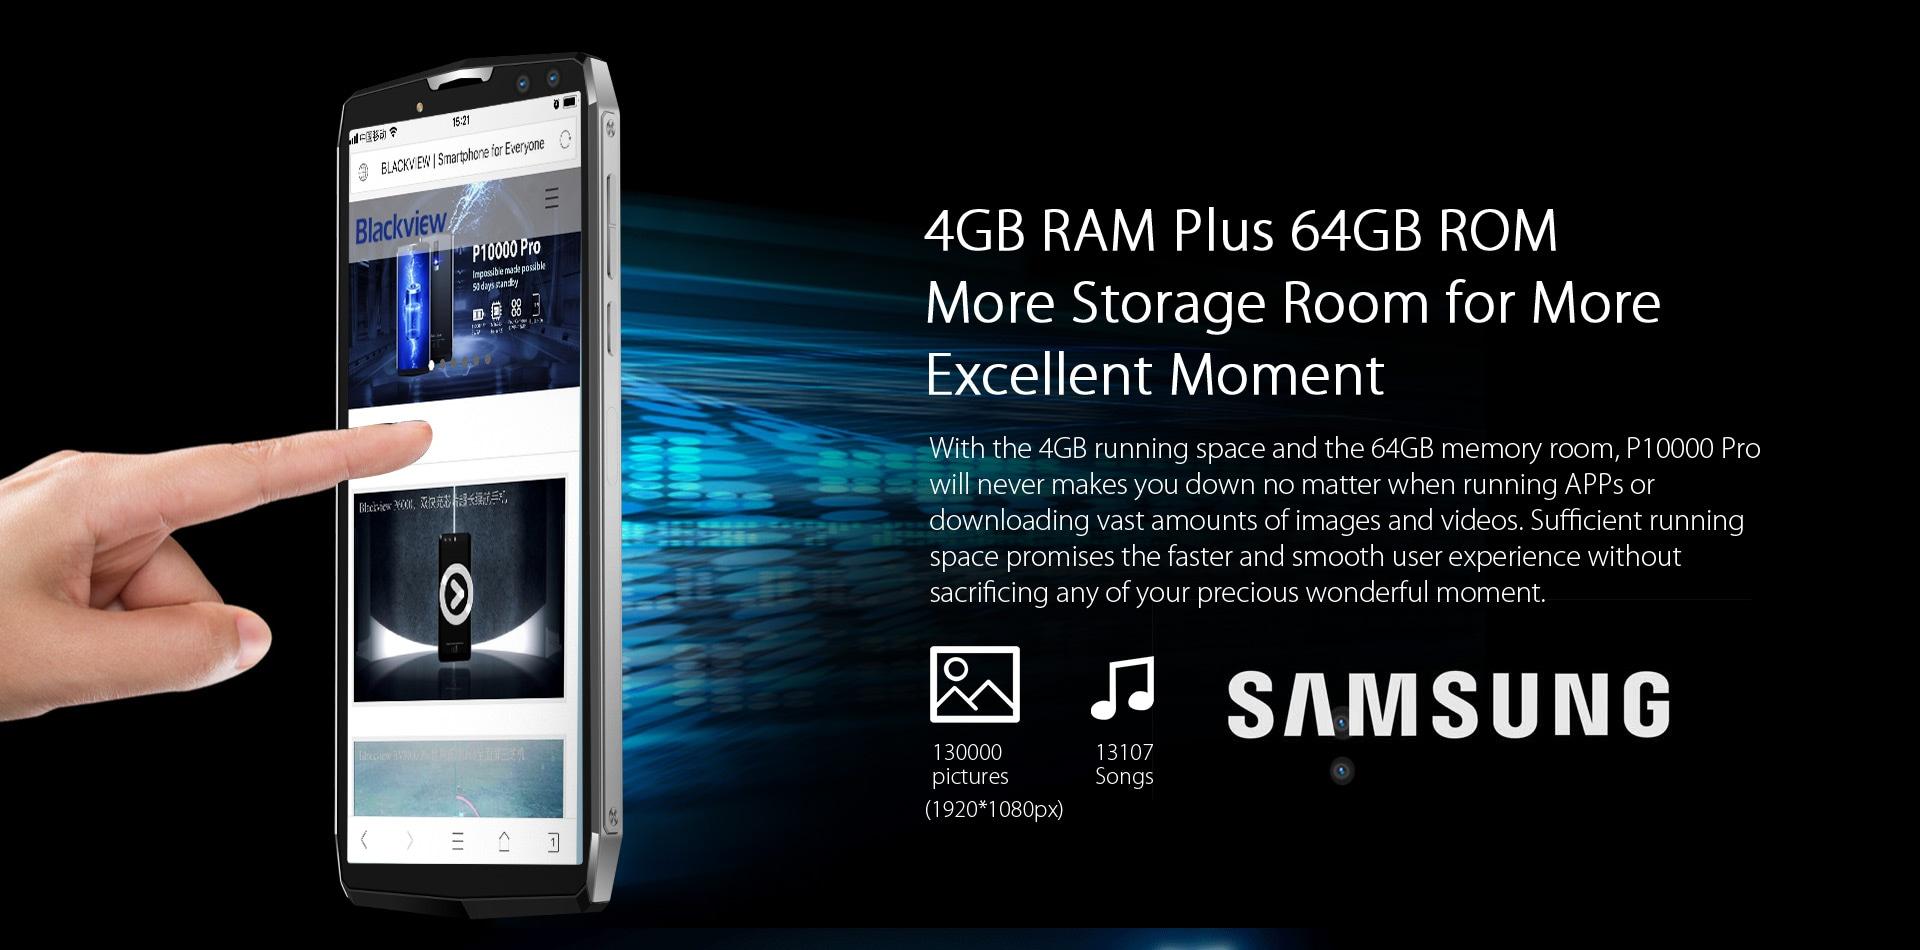 Blackview P10000 Pro 5.99 Inch FHD+ Full Screen 4GB RAM + 64GB ROM MT6763 Octa Core Smartphone Glass Black - 6